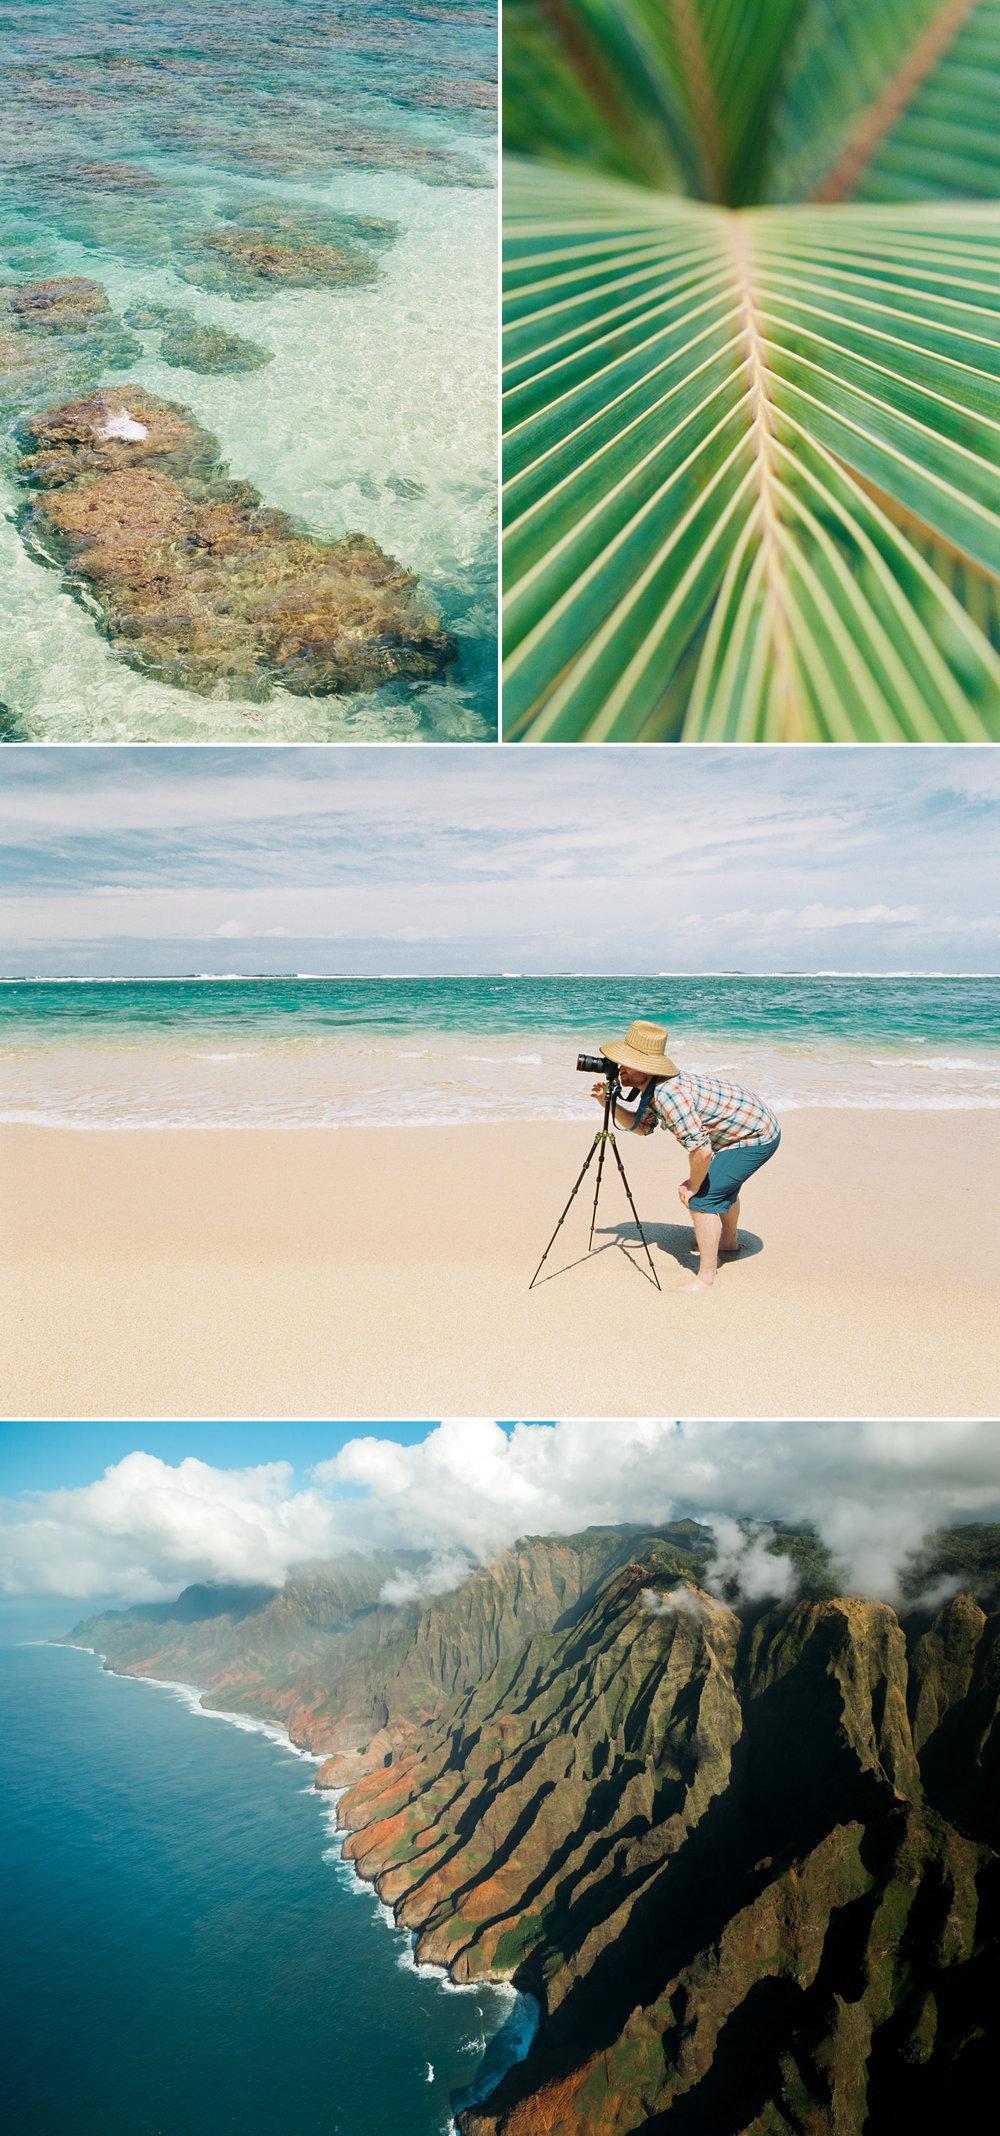 cameron-zegers-photography-travel-hawaii-kauai-24.jpg